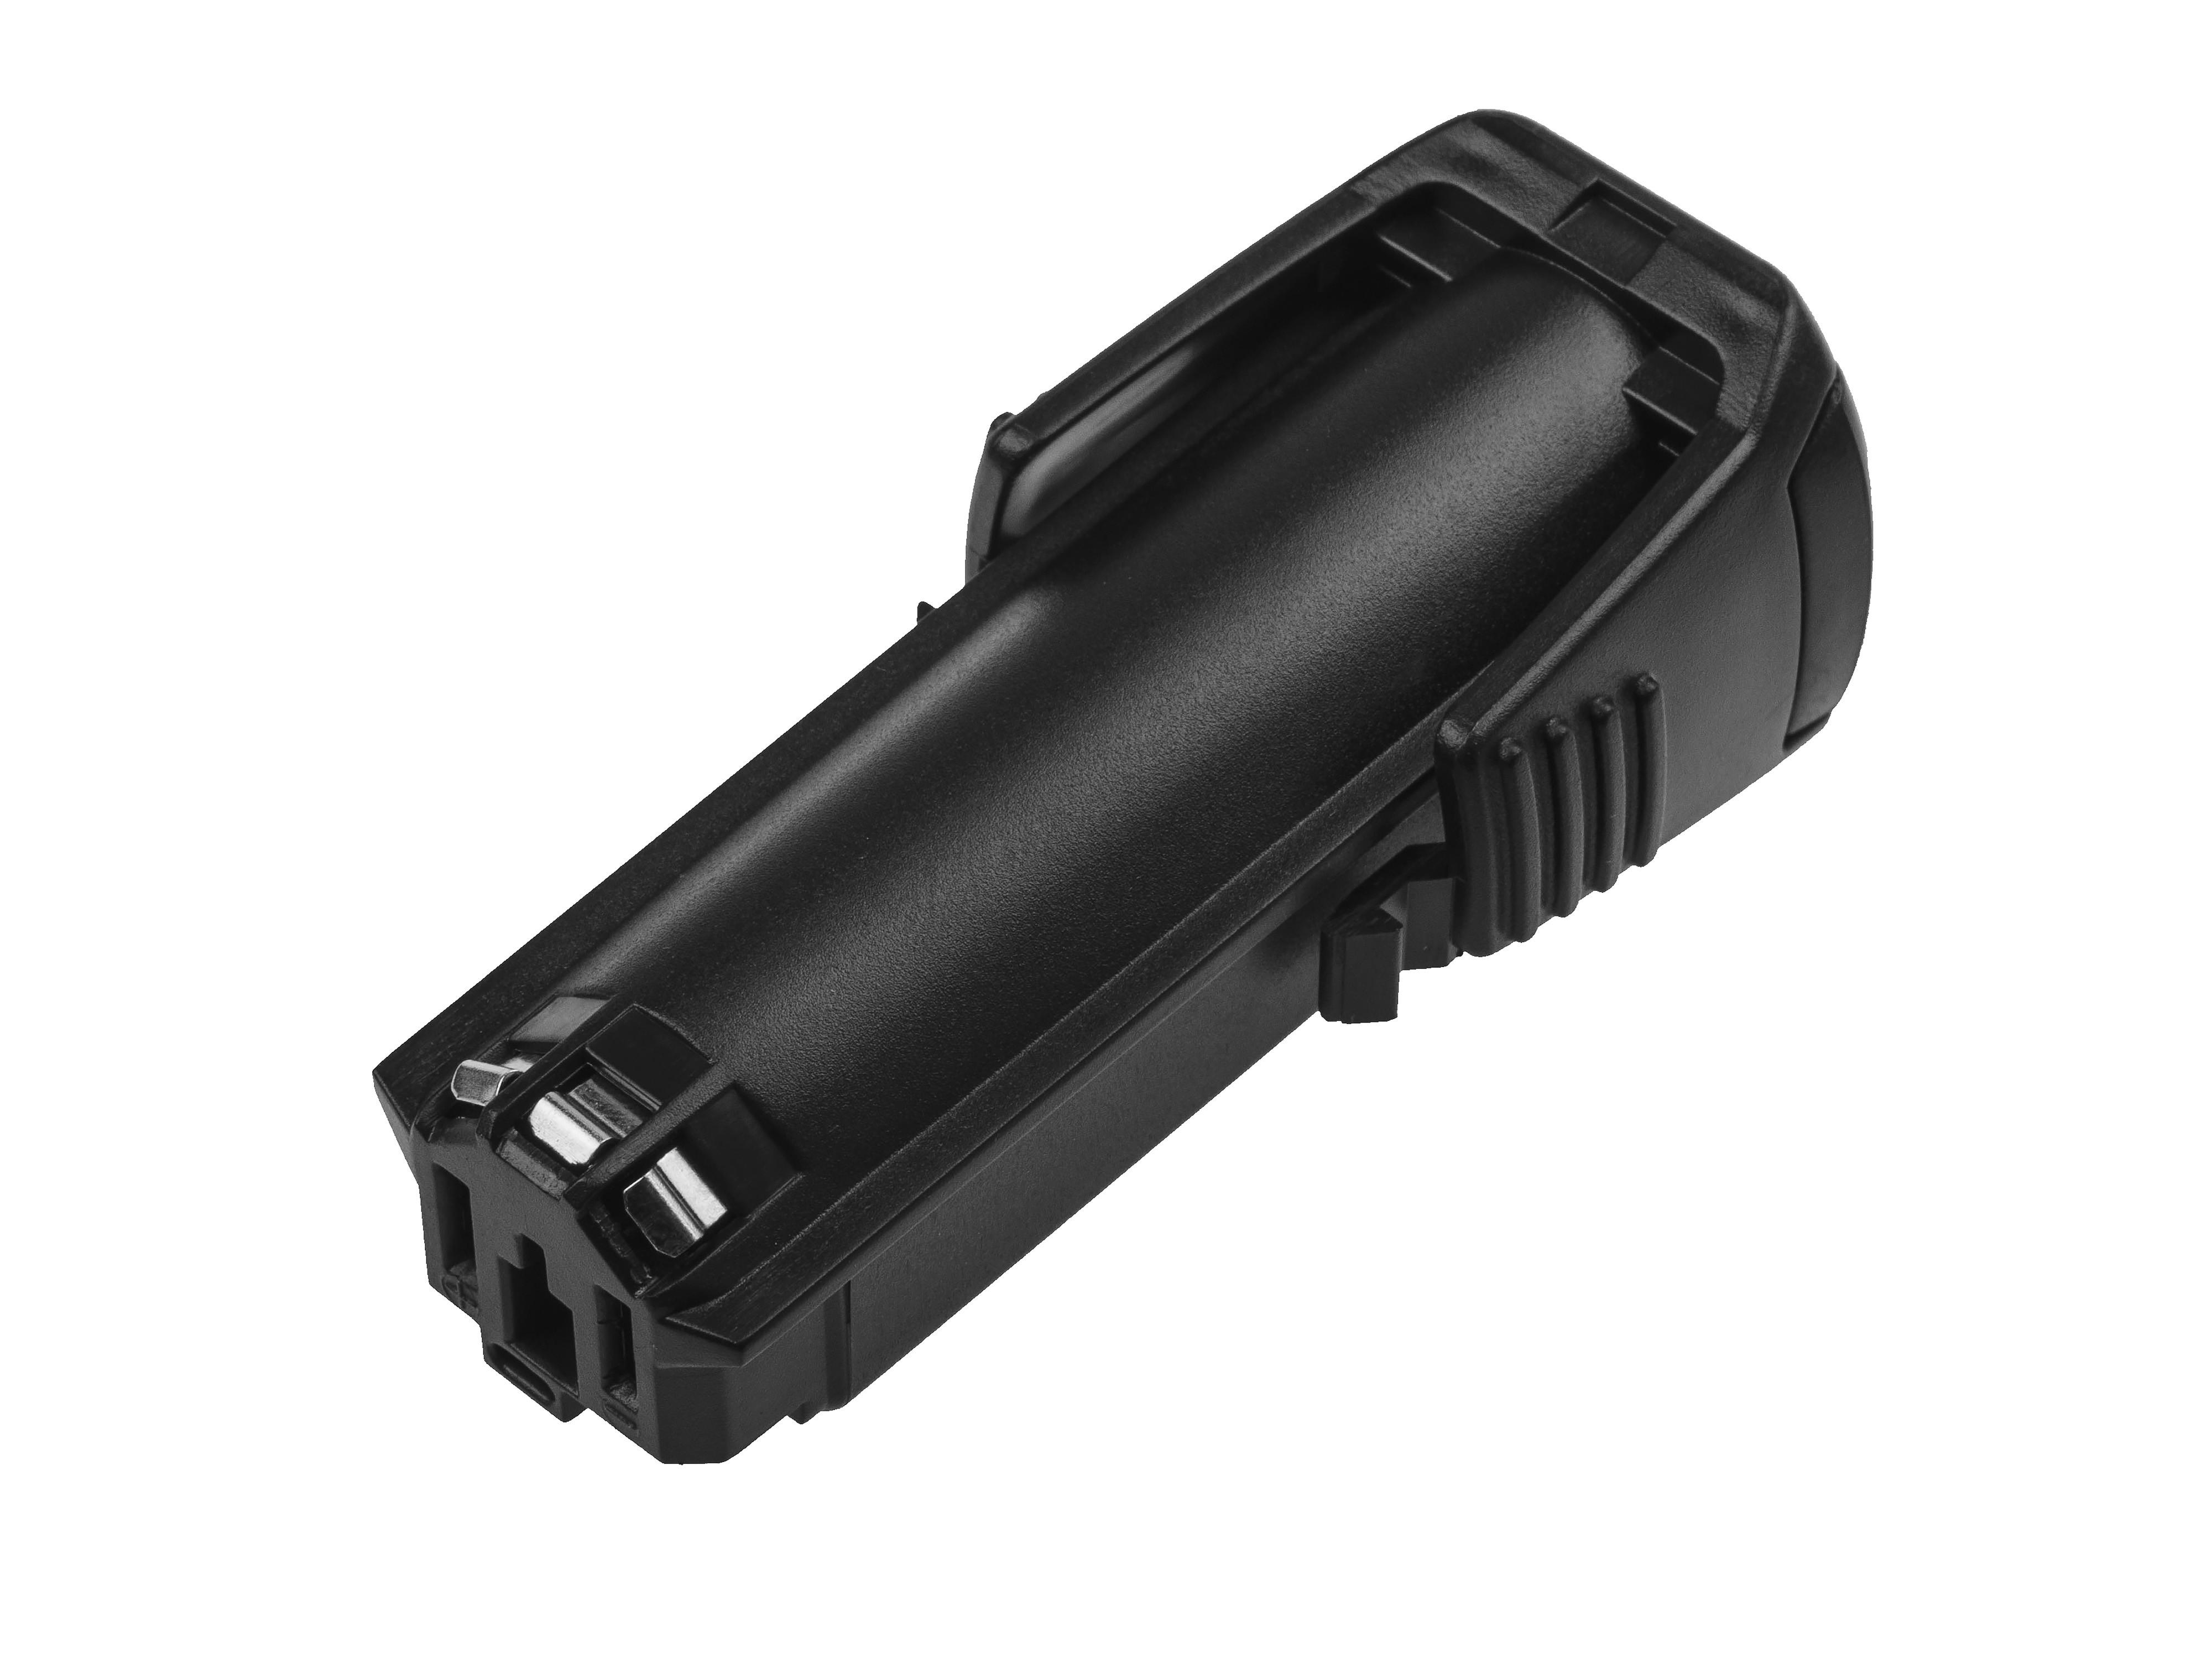 Green Cell Baterie (2Ah 3.6V) 2607336241 BAT504 pro Bosch GSR GBA 3.6 PRODRIVE Mx2Drive